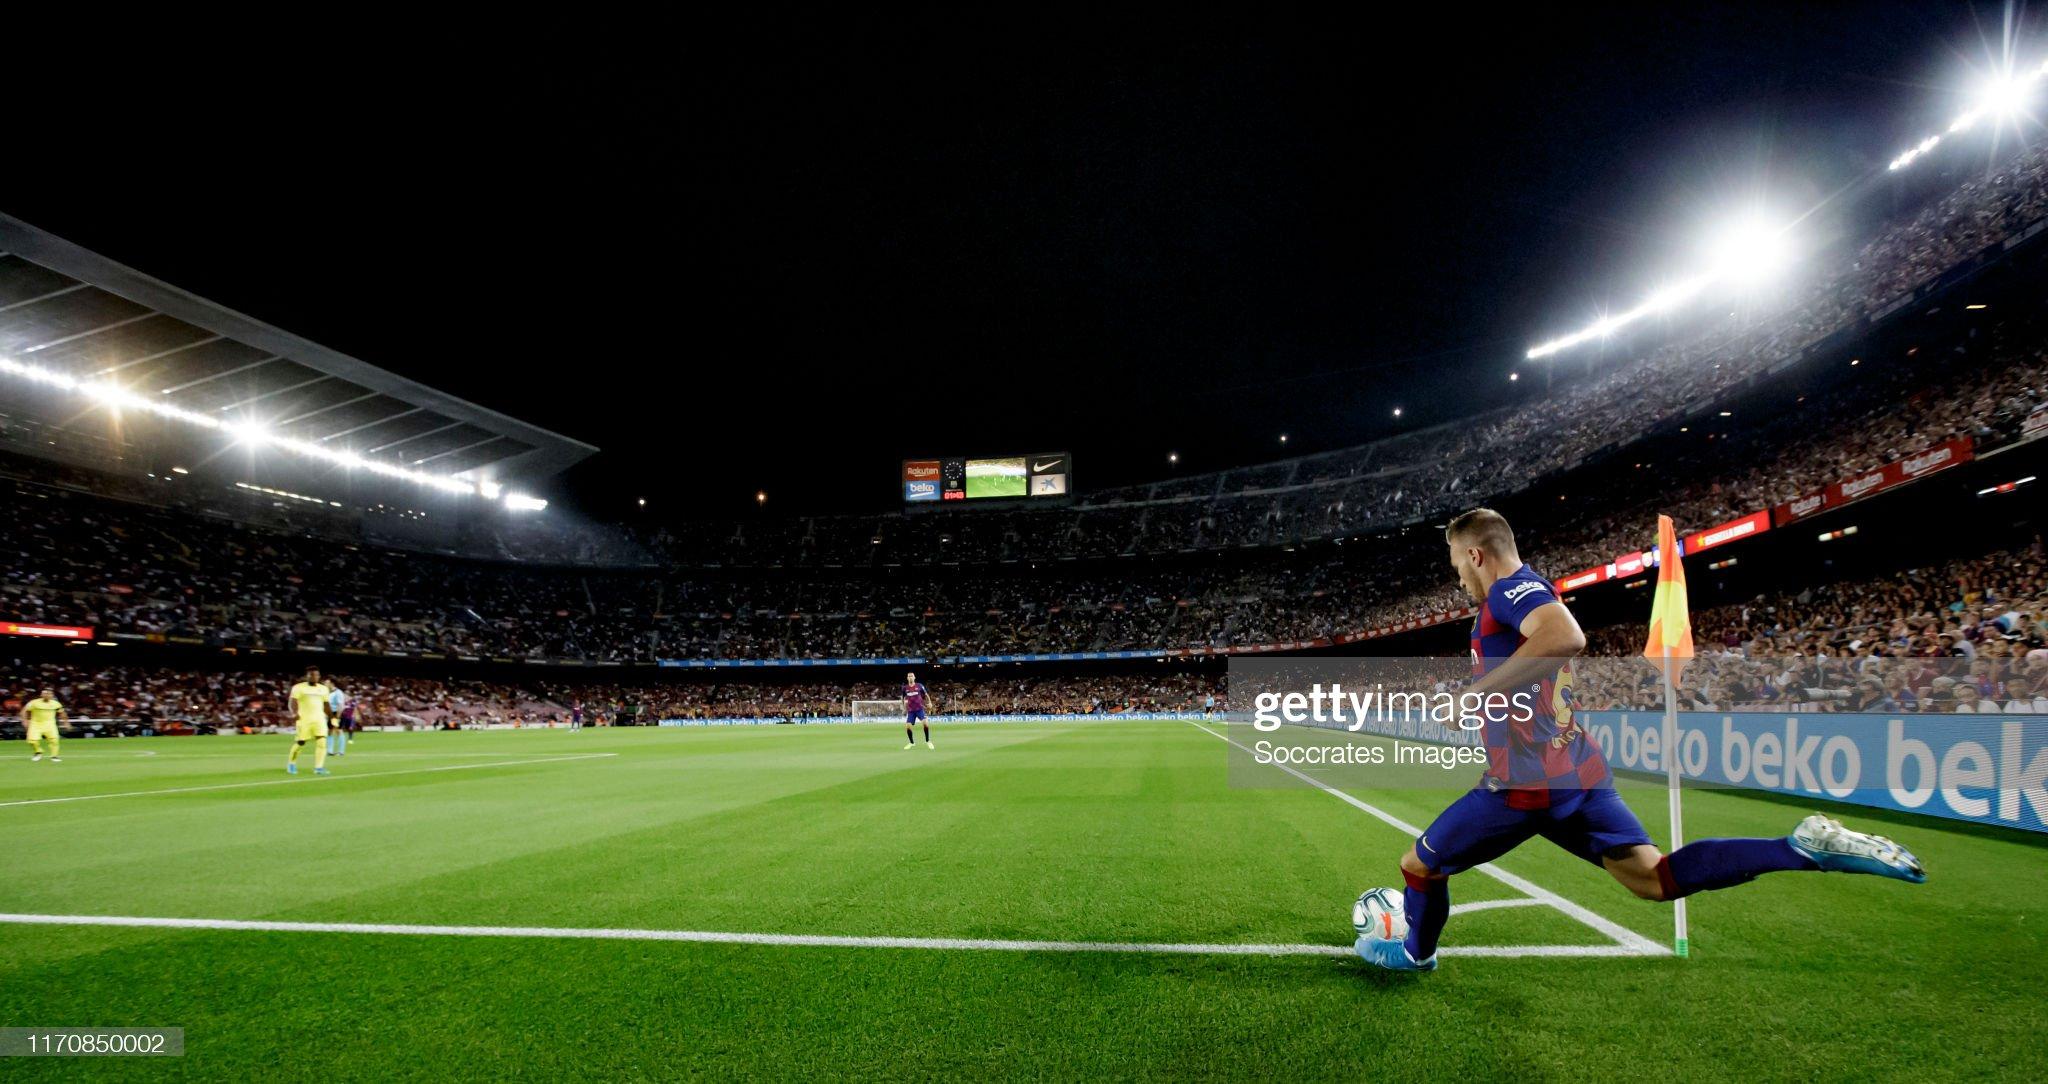 صور مباراة : برشلونة - فياريال 2-1 ( 24-09-2019 )  Arthur-of-fc-barcelona-during-the-la-liga-santander-match-between-fc-picture-id1170850002?s=2048x2048